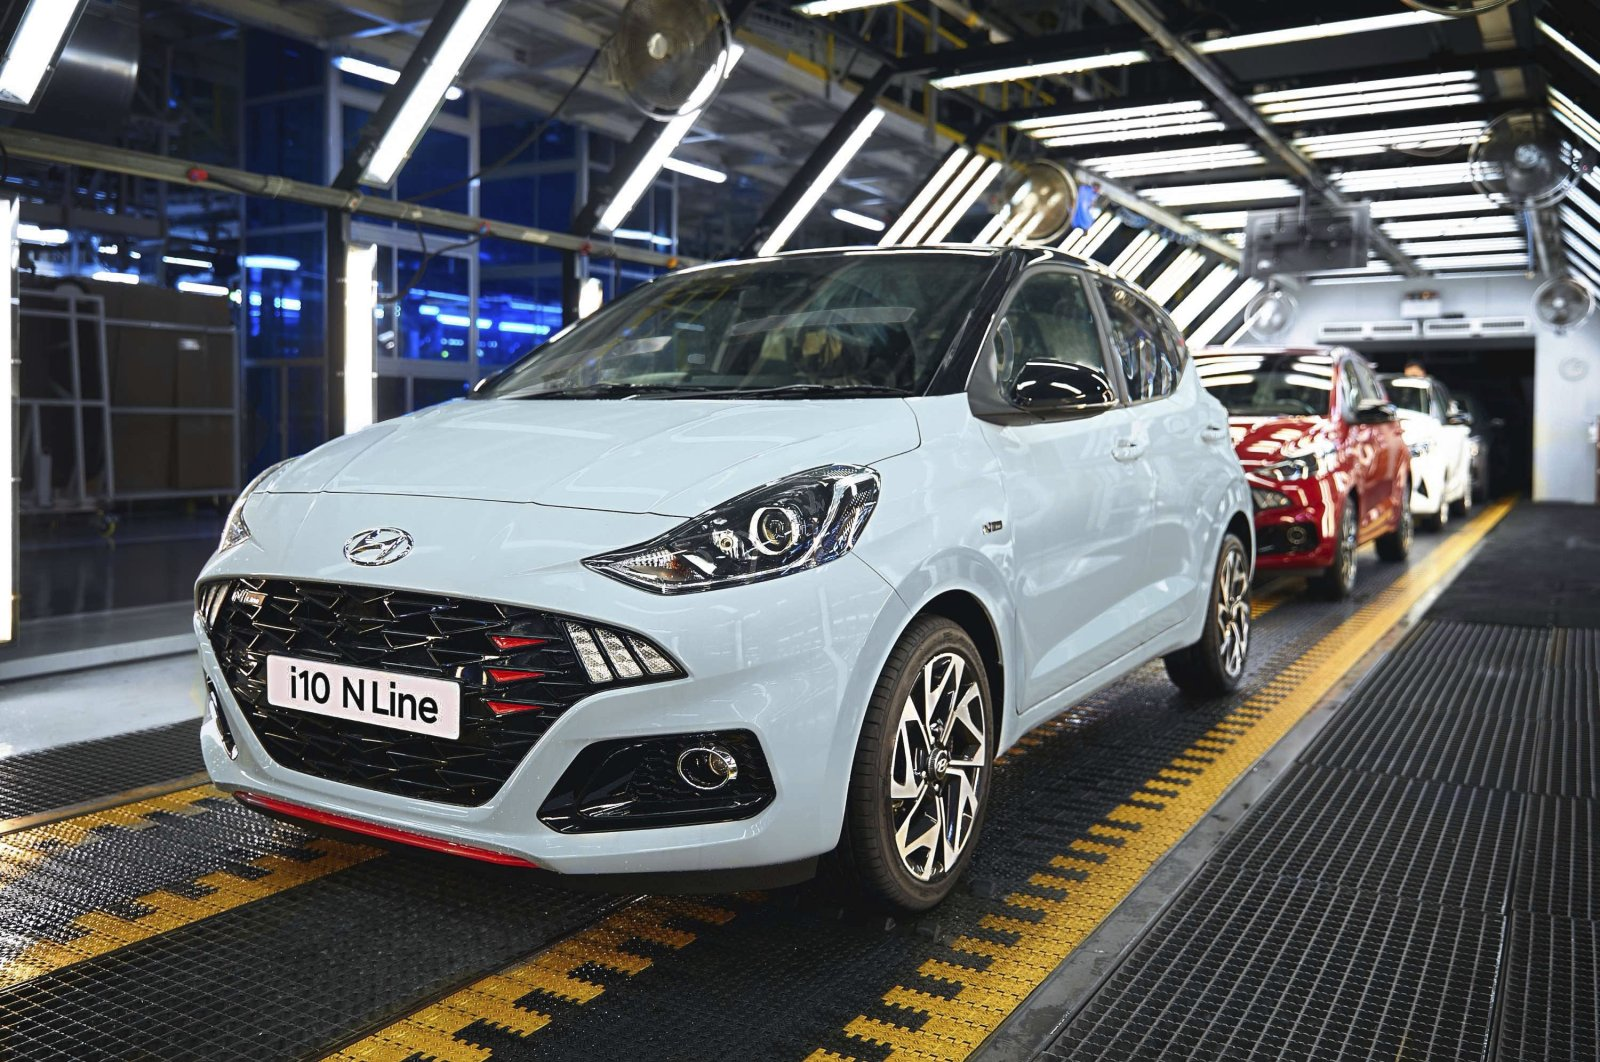 Hyundai Assan car factory, İzmit, northwestern Turkey, June 30, 2020. (Sabah File Photo)